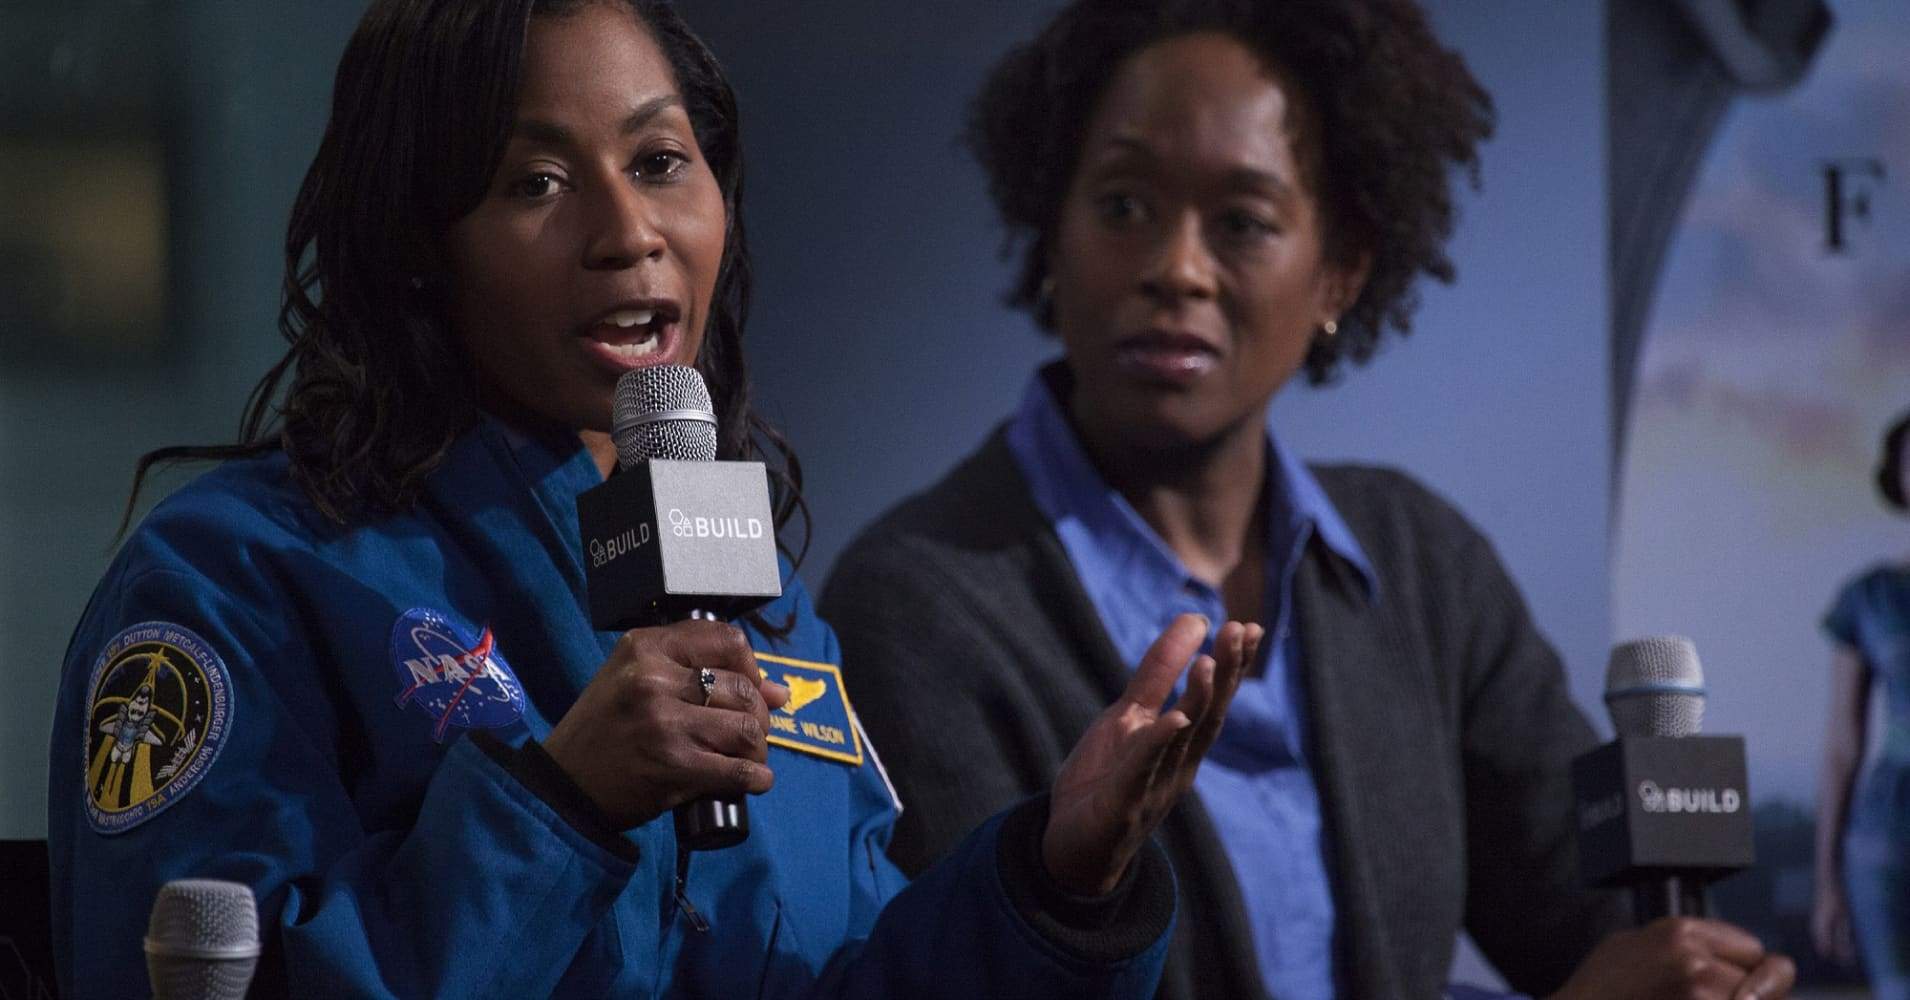 NASA Astronaut Stephanie Wilson and author Margot Lee Shetterly